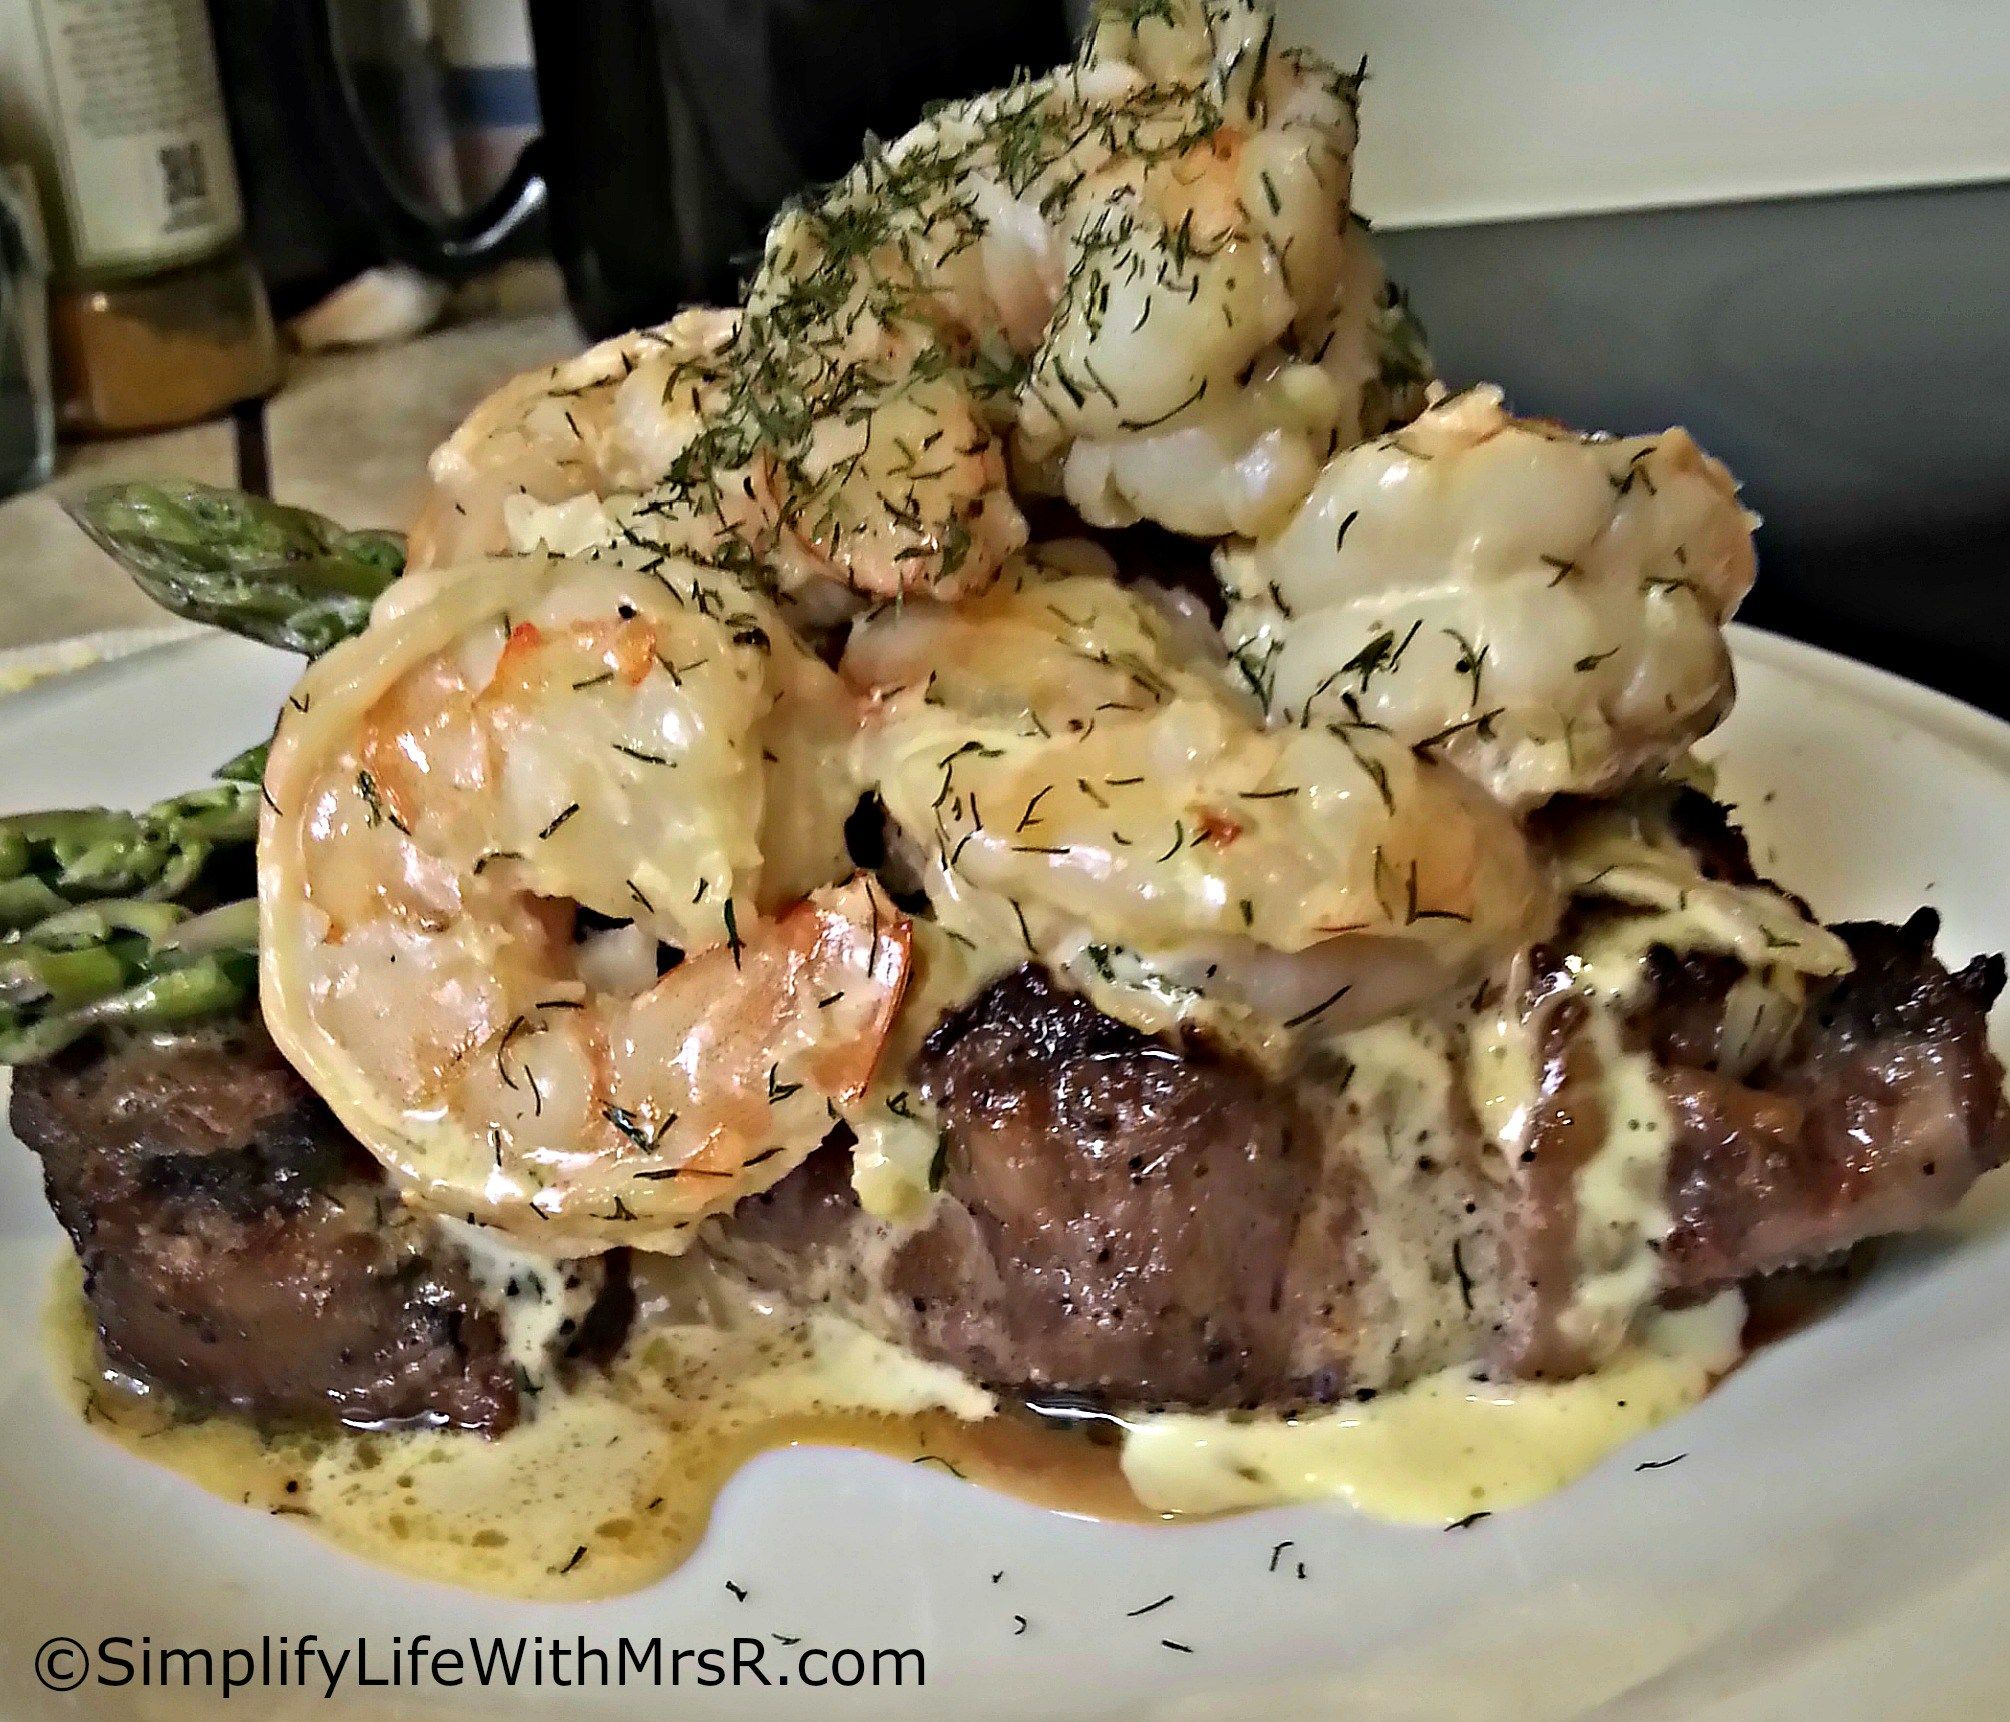 how to cook a tasty fillet steak